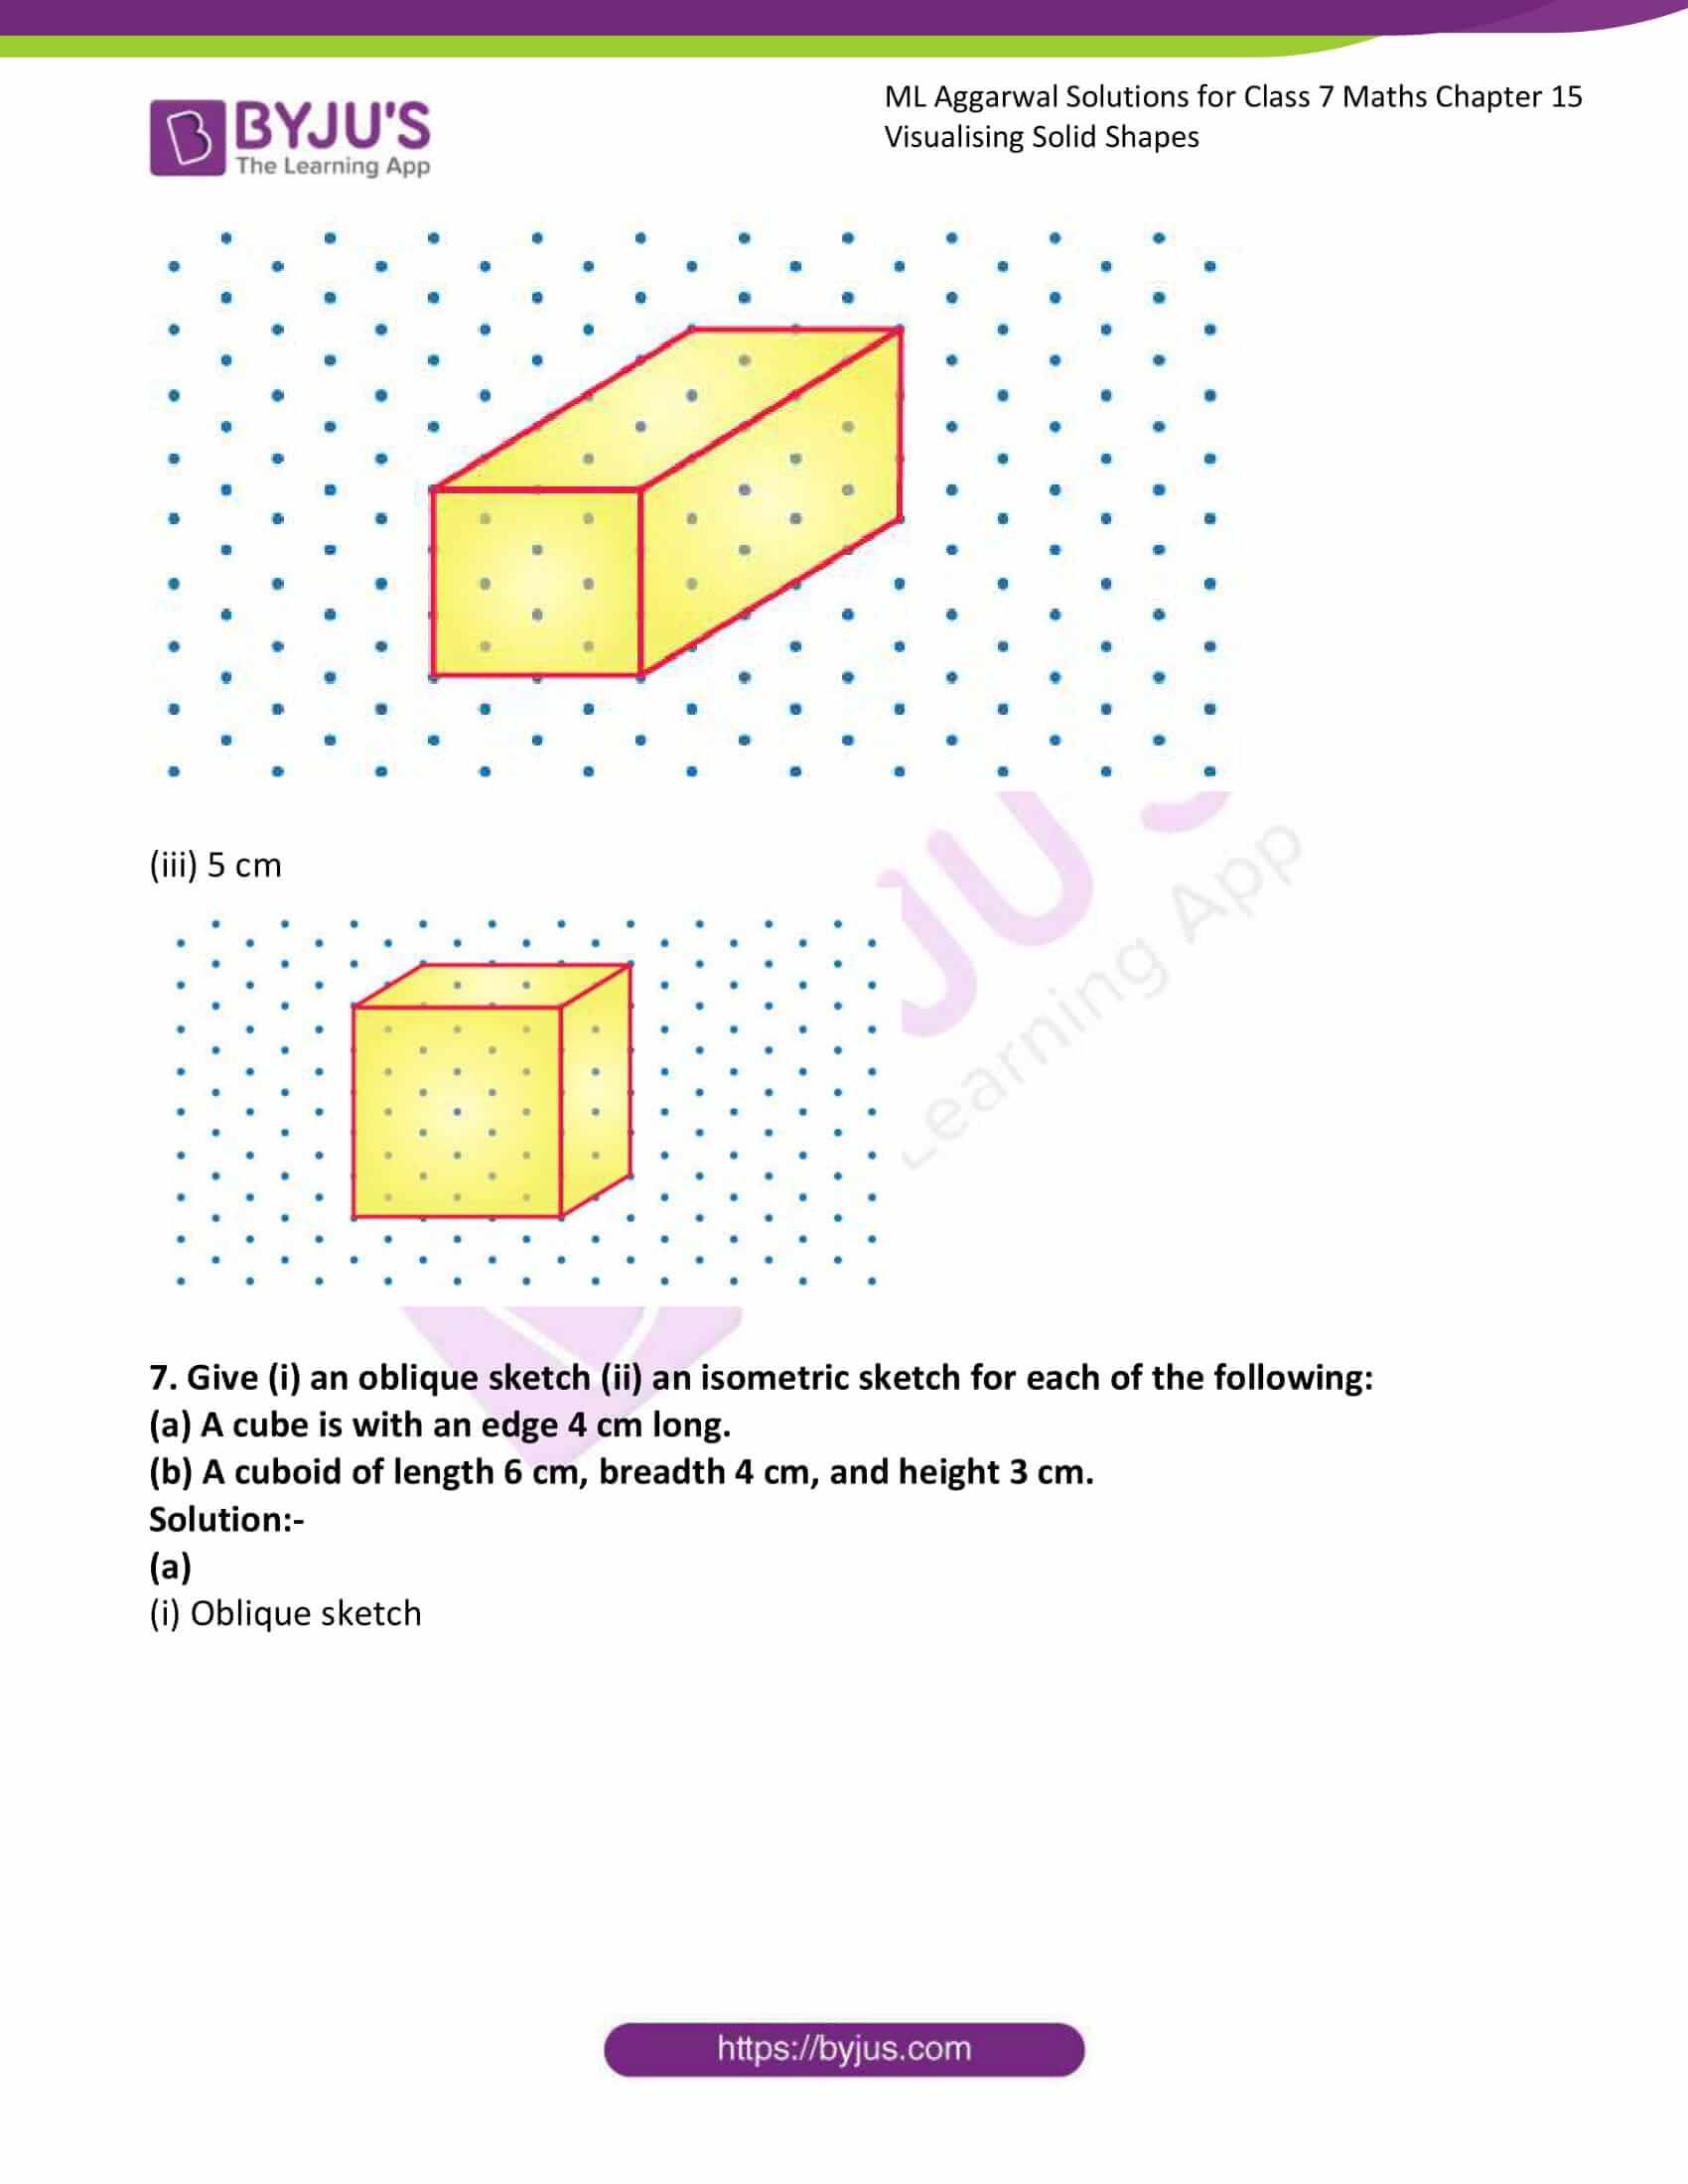 ml aggarwal sol class 7 maths chapter 15 9